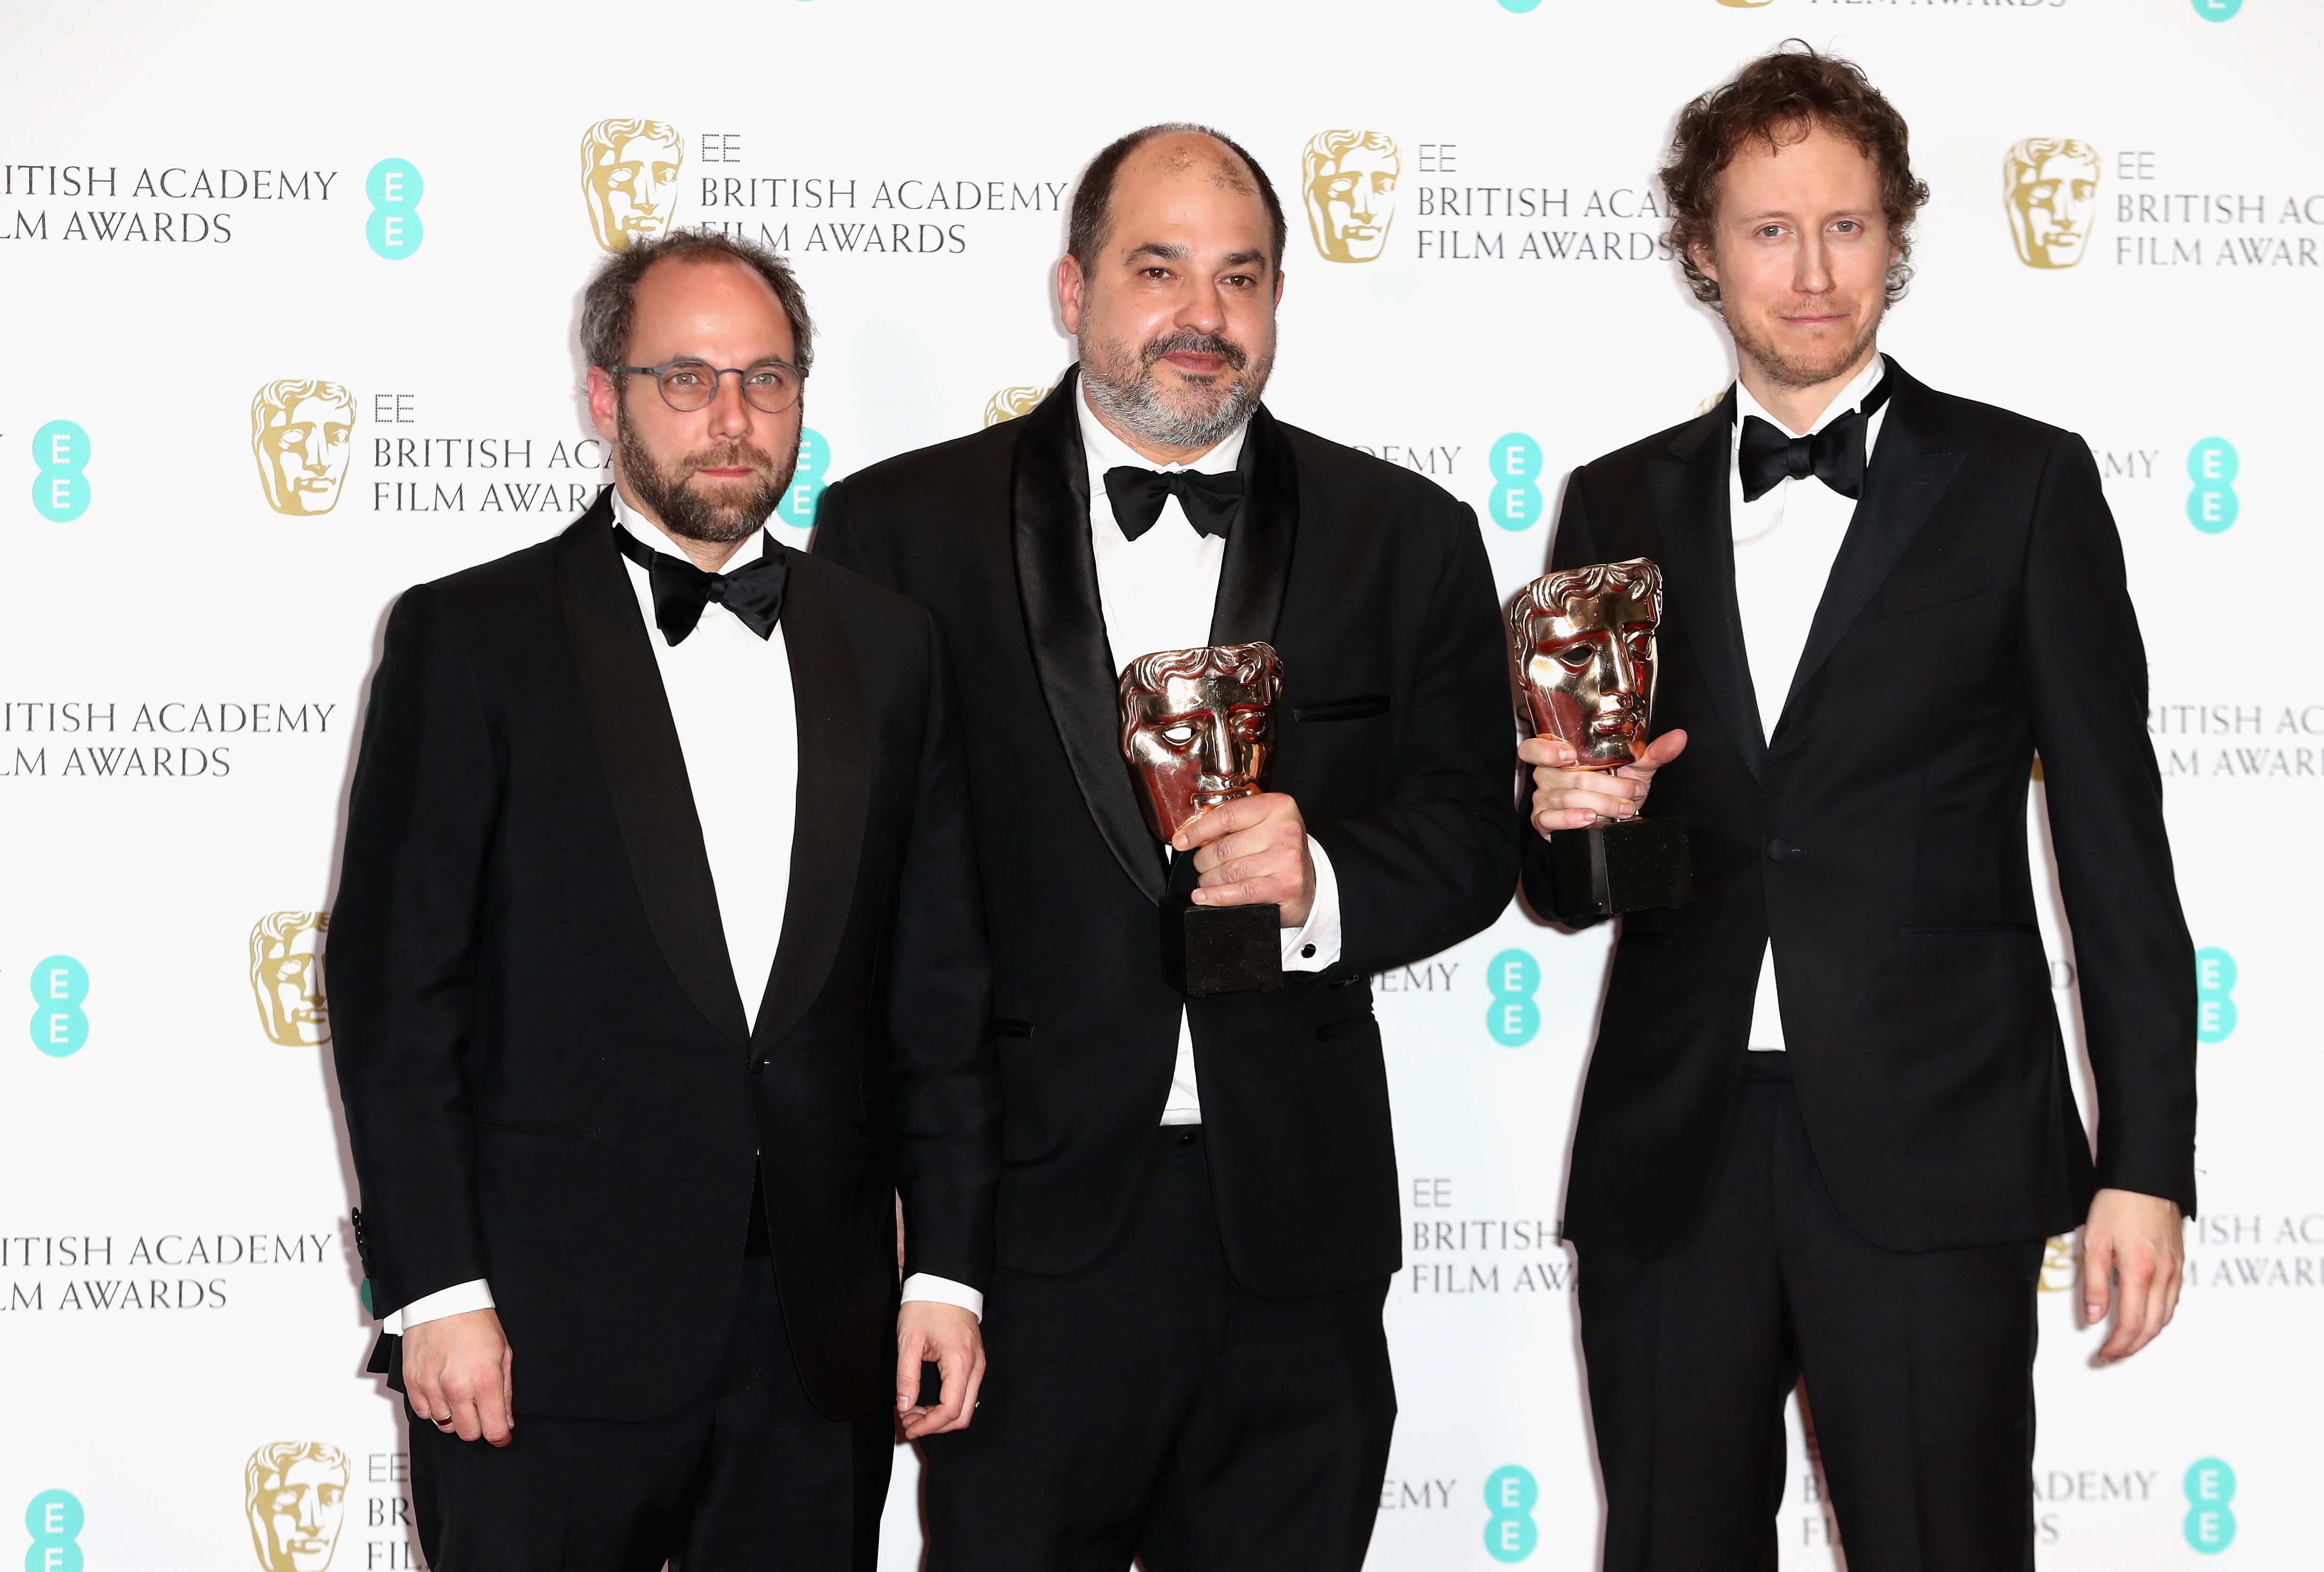 Gabor Sipos, Gabor Rajna i Laszlo Nemes iz mađarskog filma 'Saulov sin' na dodjeli nagrada BAFTA 2017. godine